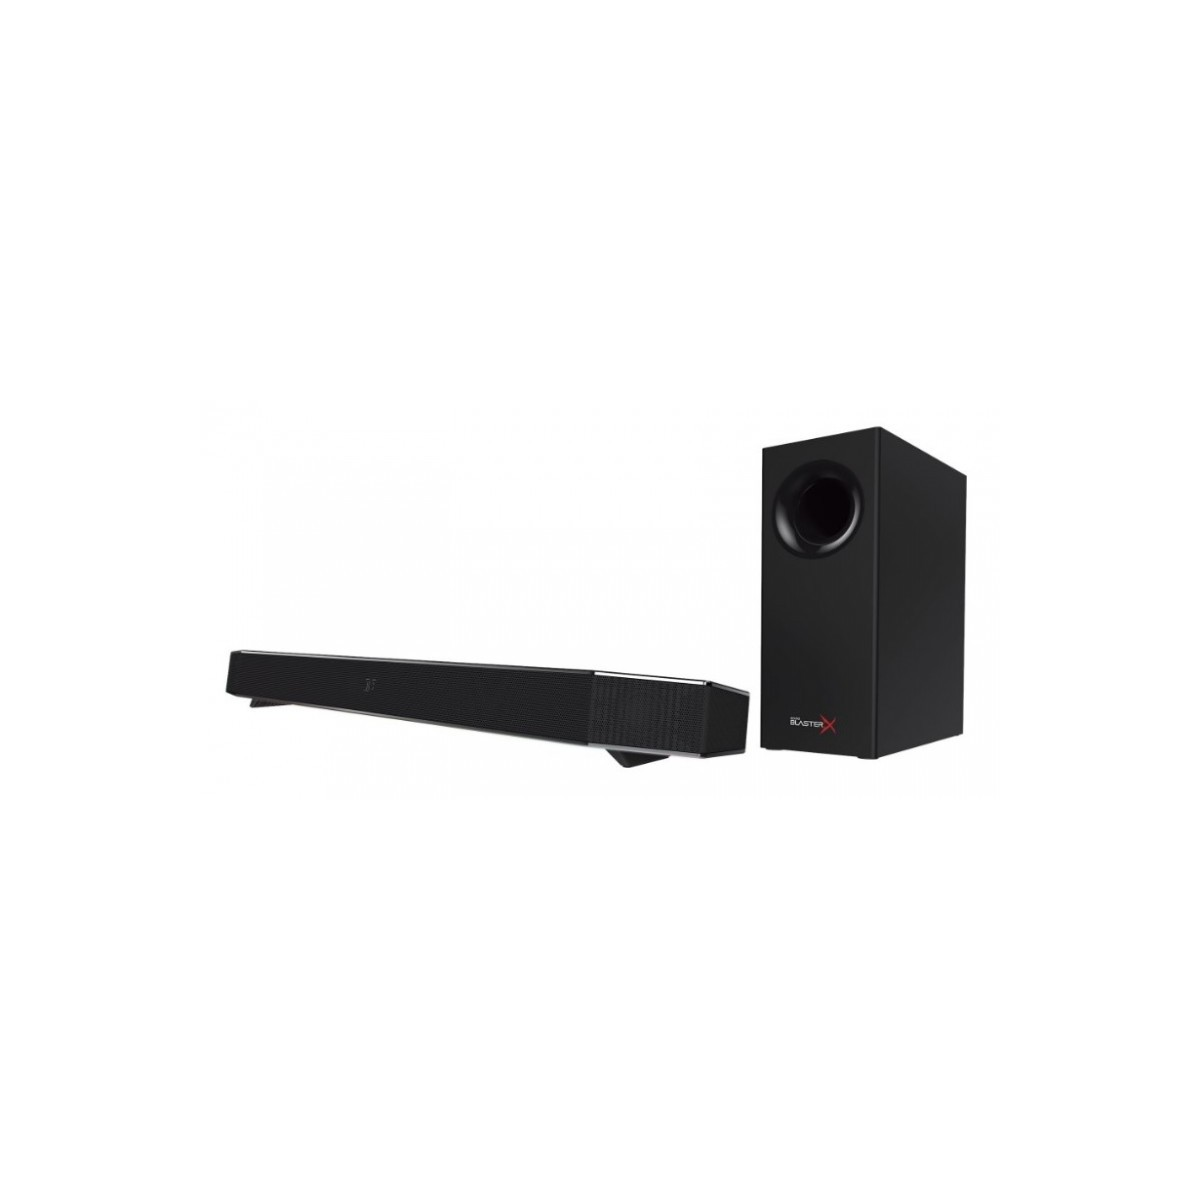 Caja ATX Corsair Carbide Spec-Omega RGB Semitorre Negra Cristal